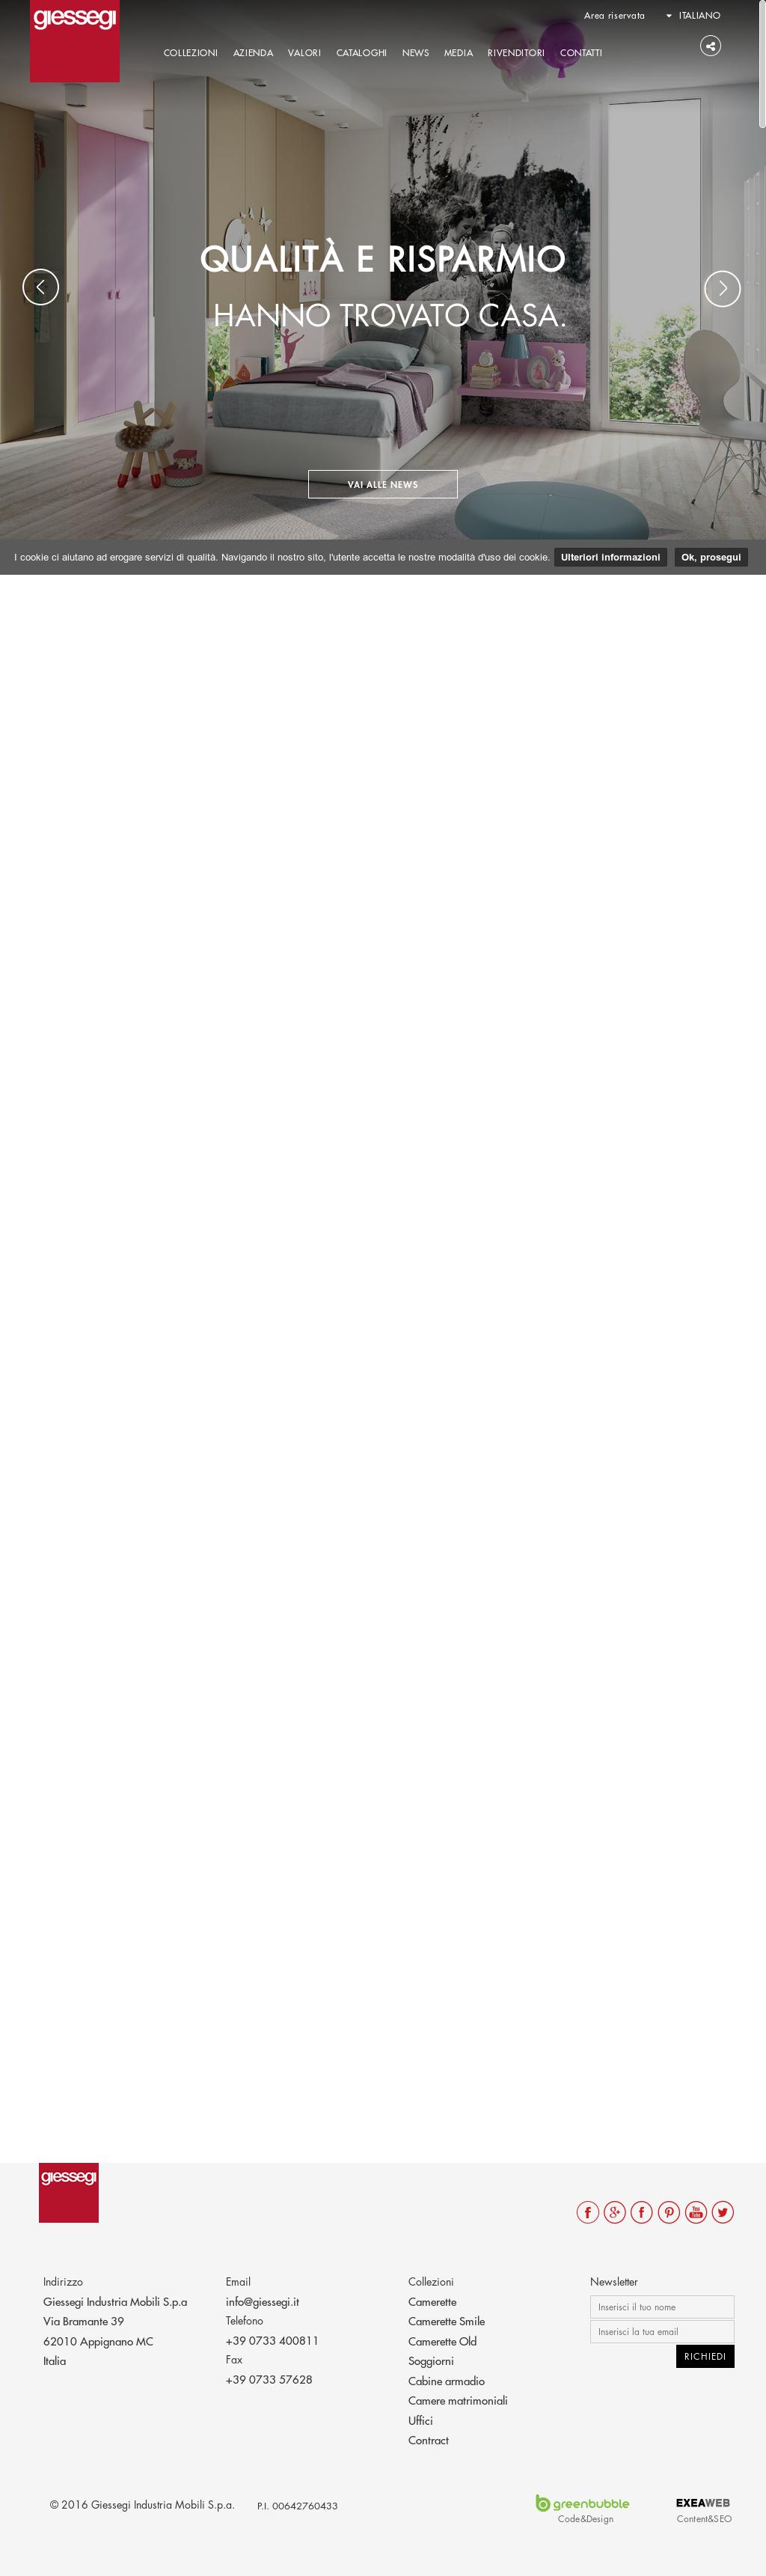 Giessegi Mobili Competitors, Revenue and Employees - Owler Company ...